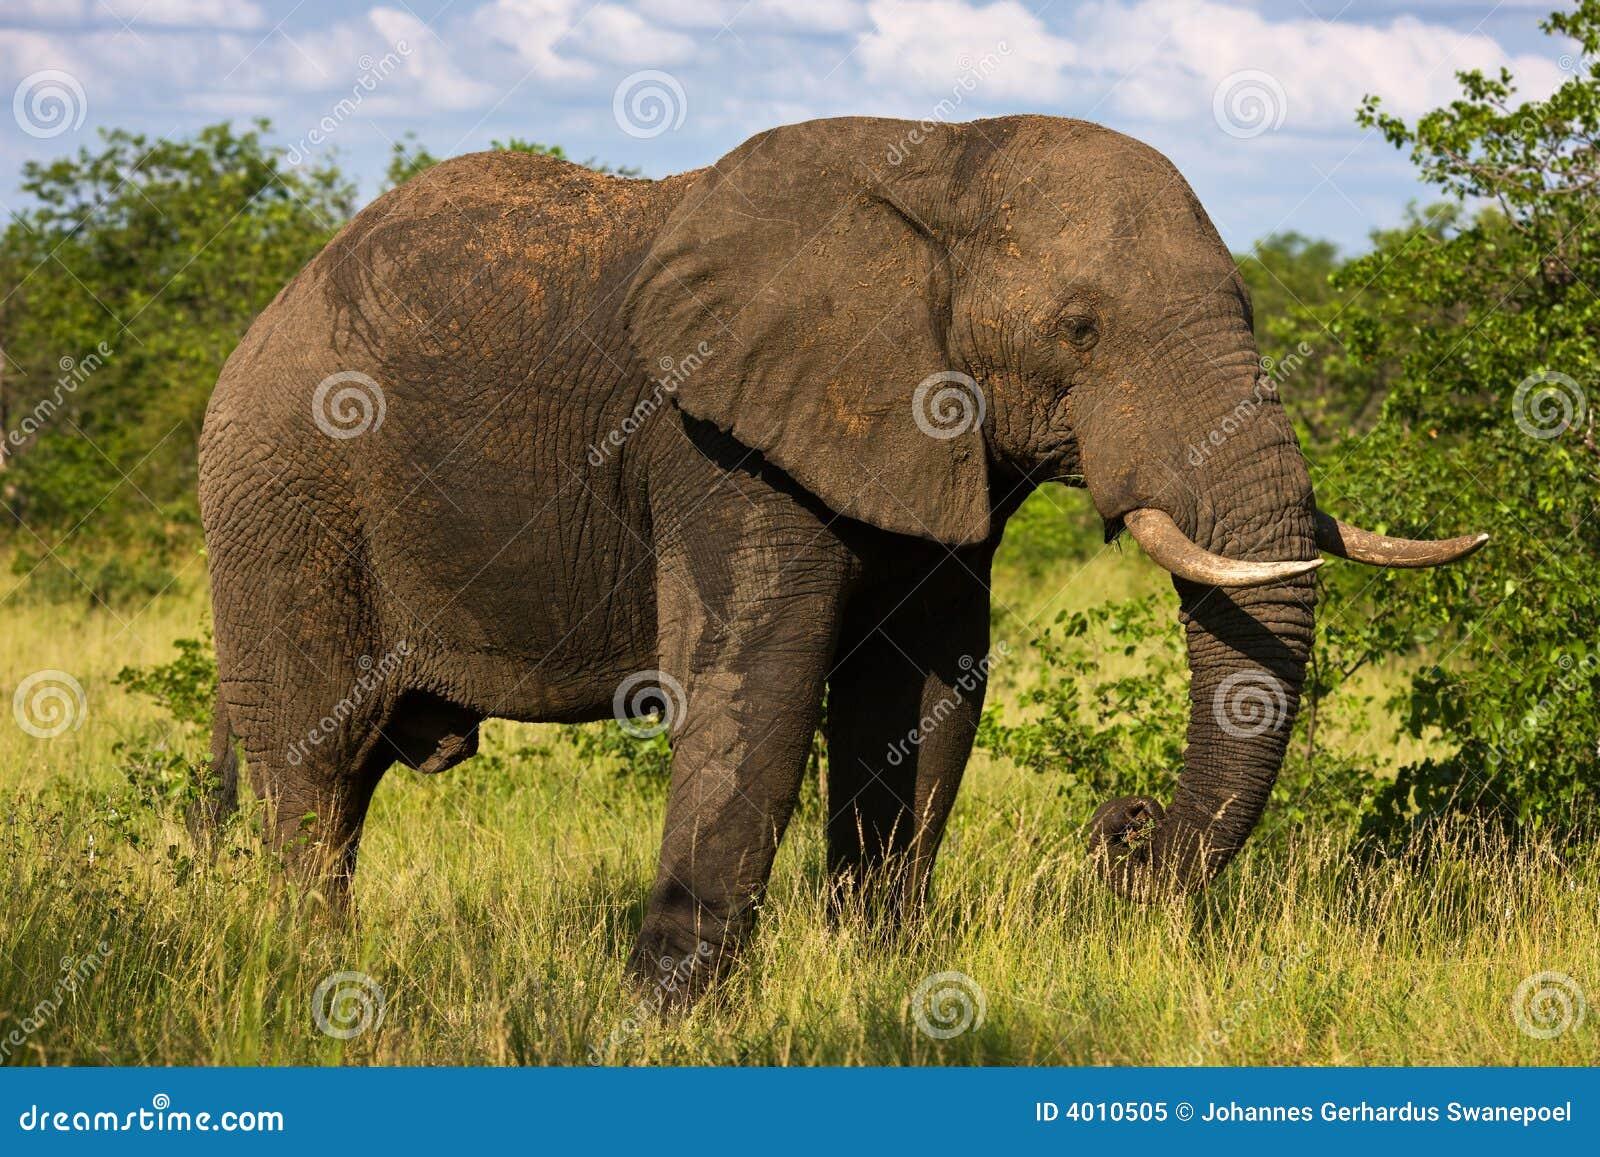 - elephant-bull-4010505